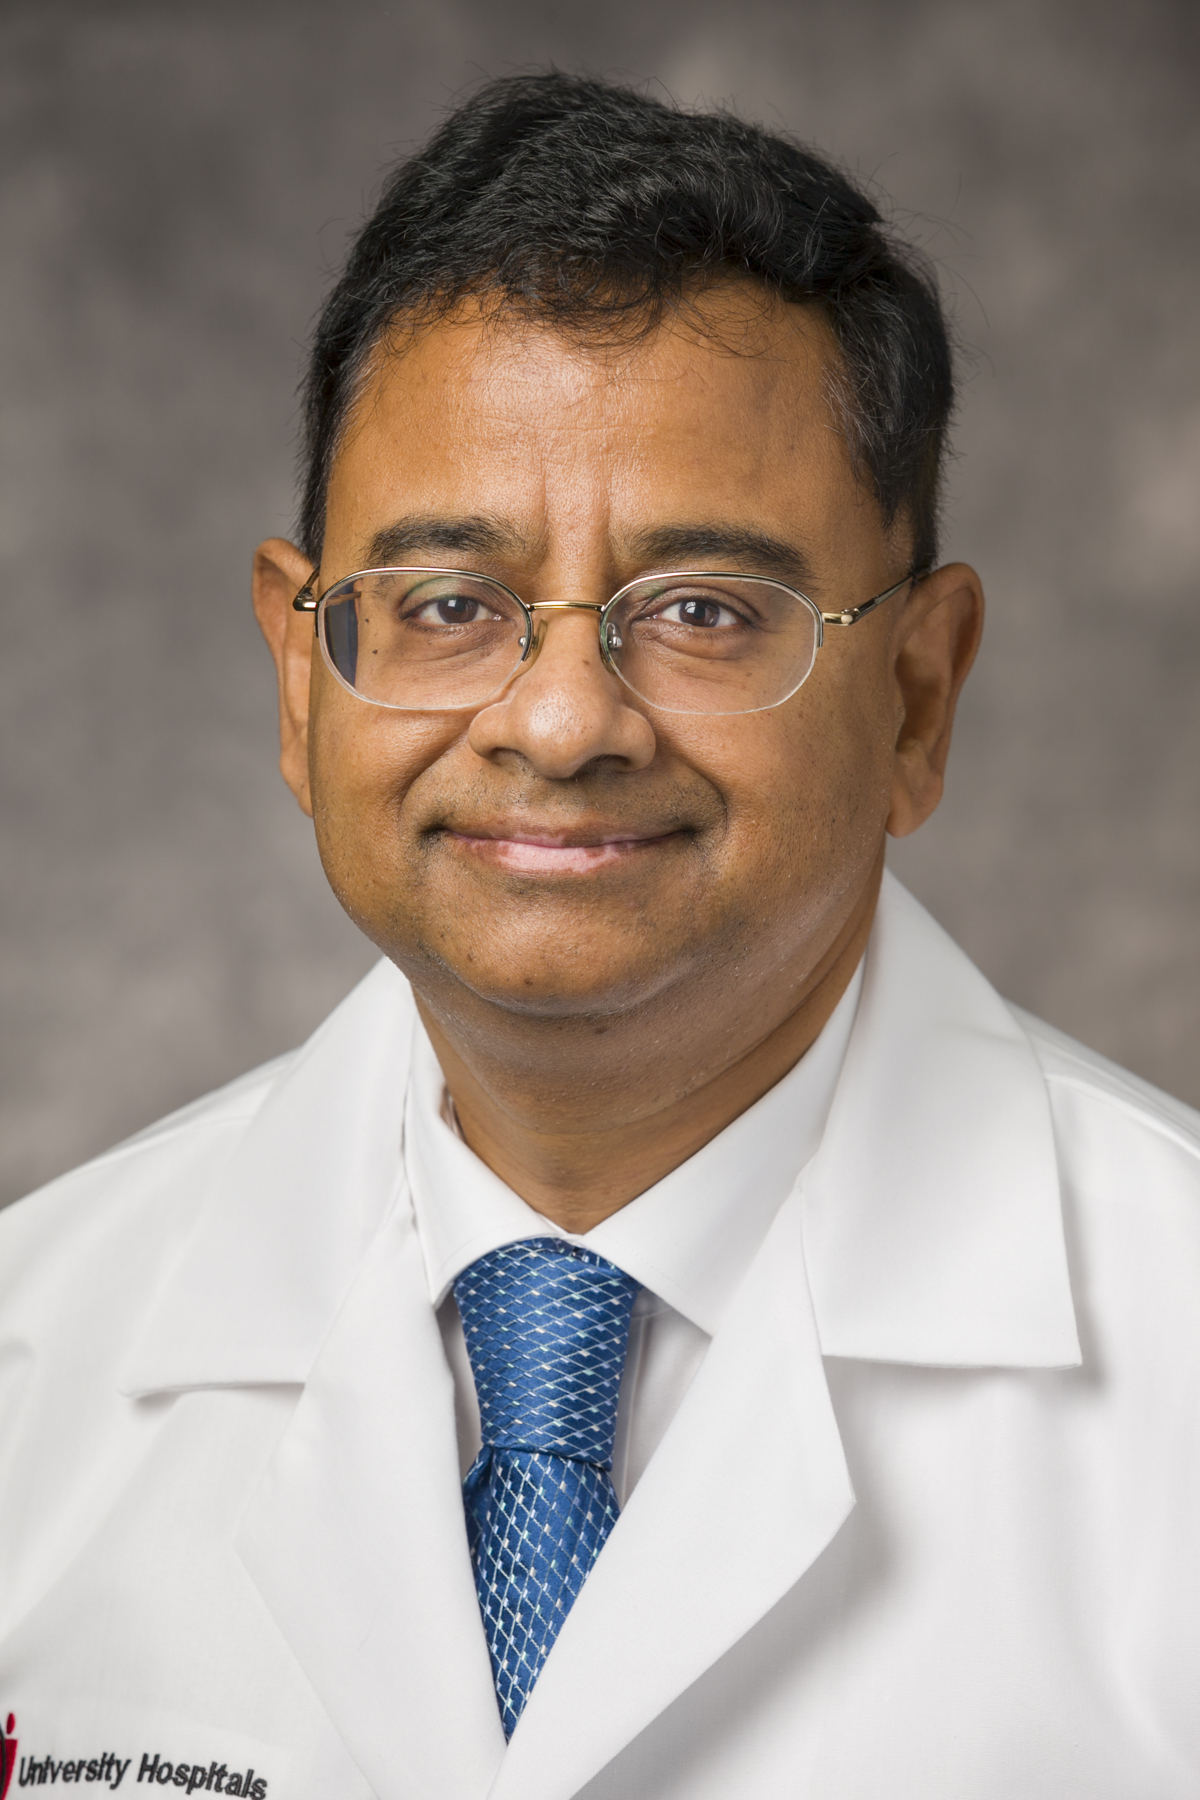 Anjan Gupta, MD